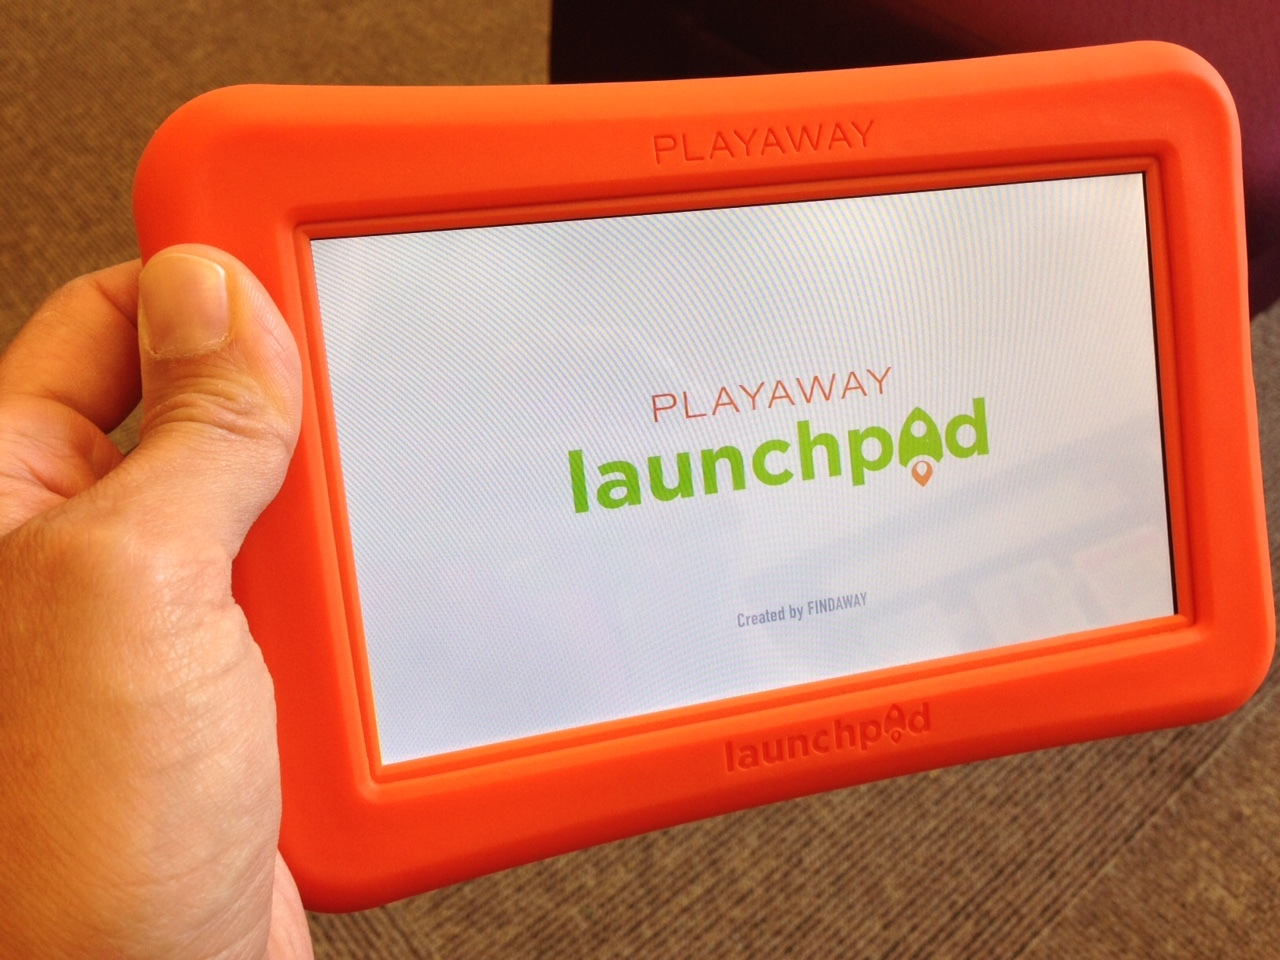 6a94873e7434b3032c6c_SCLSNJ_Playaway_Launchpad.jpg